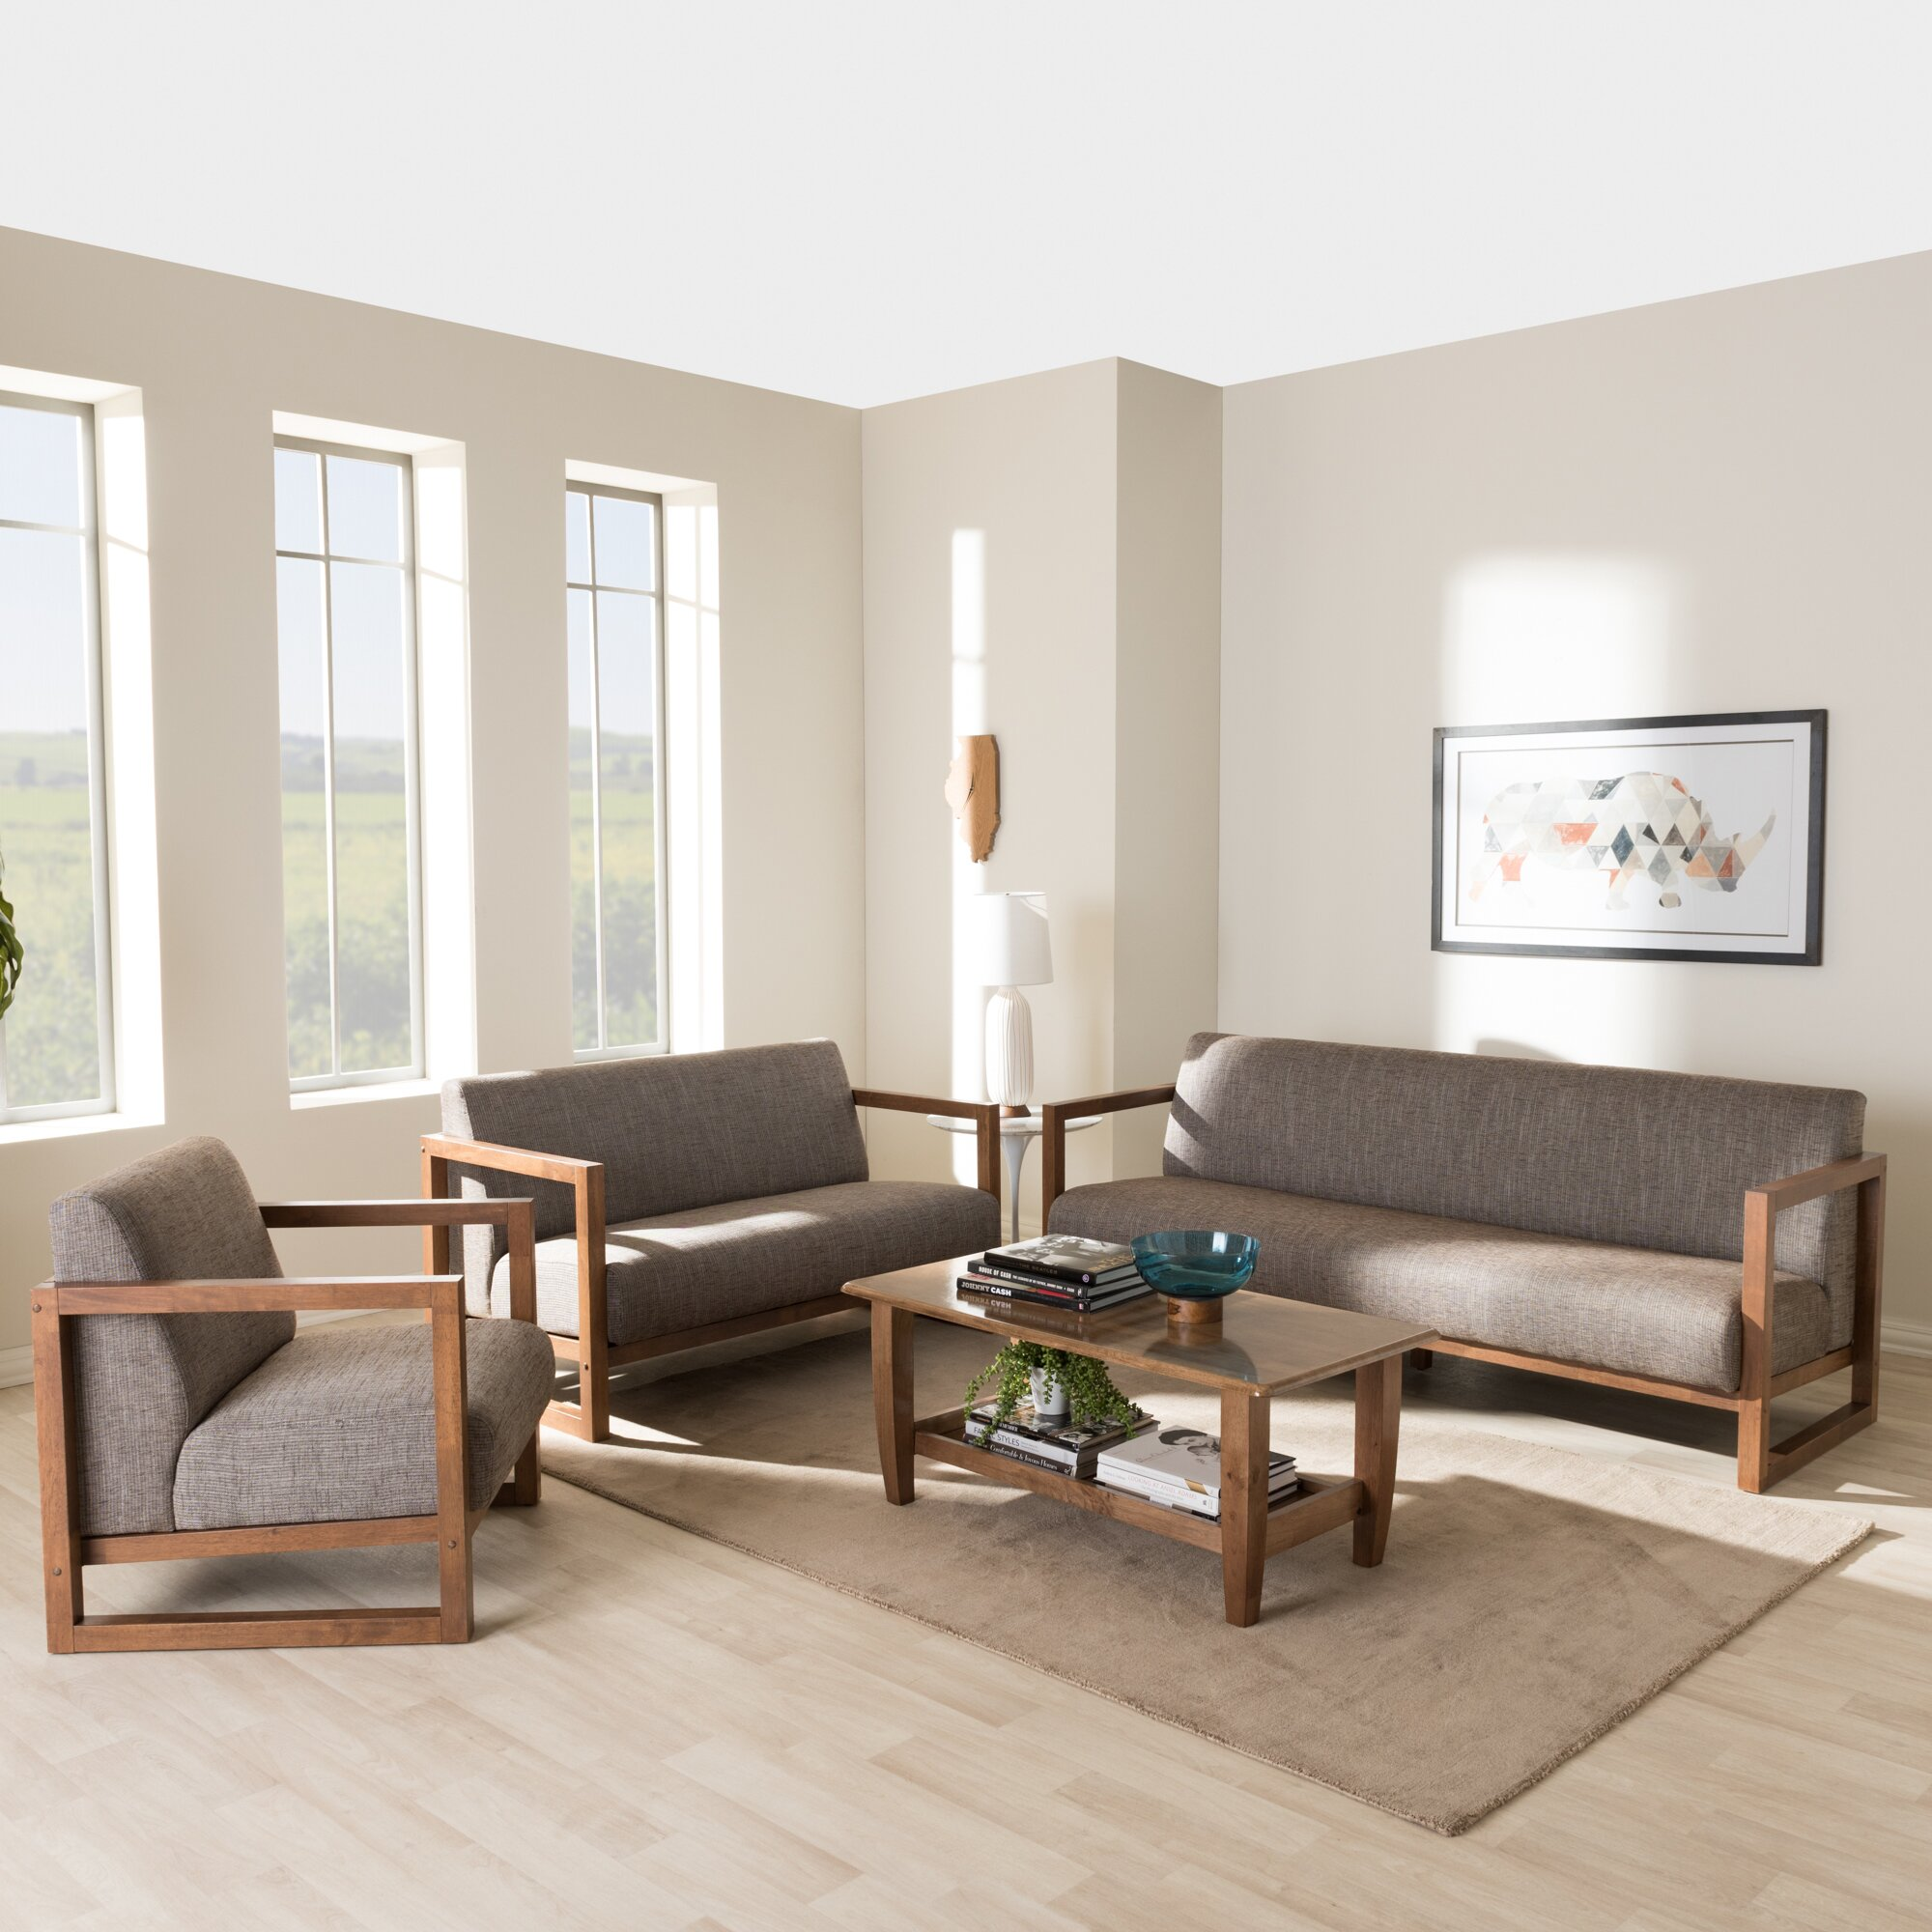 interiors baxton studio valencia mid century 3 piece living room set